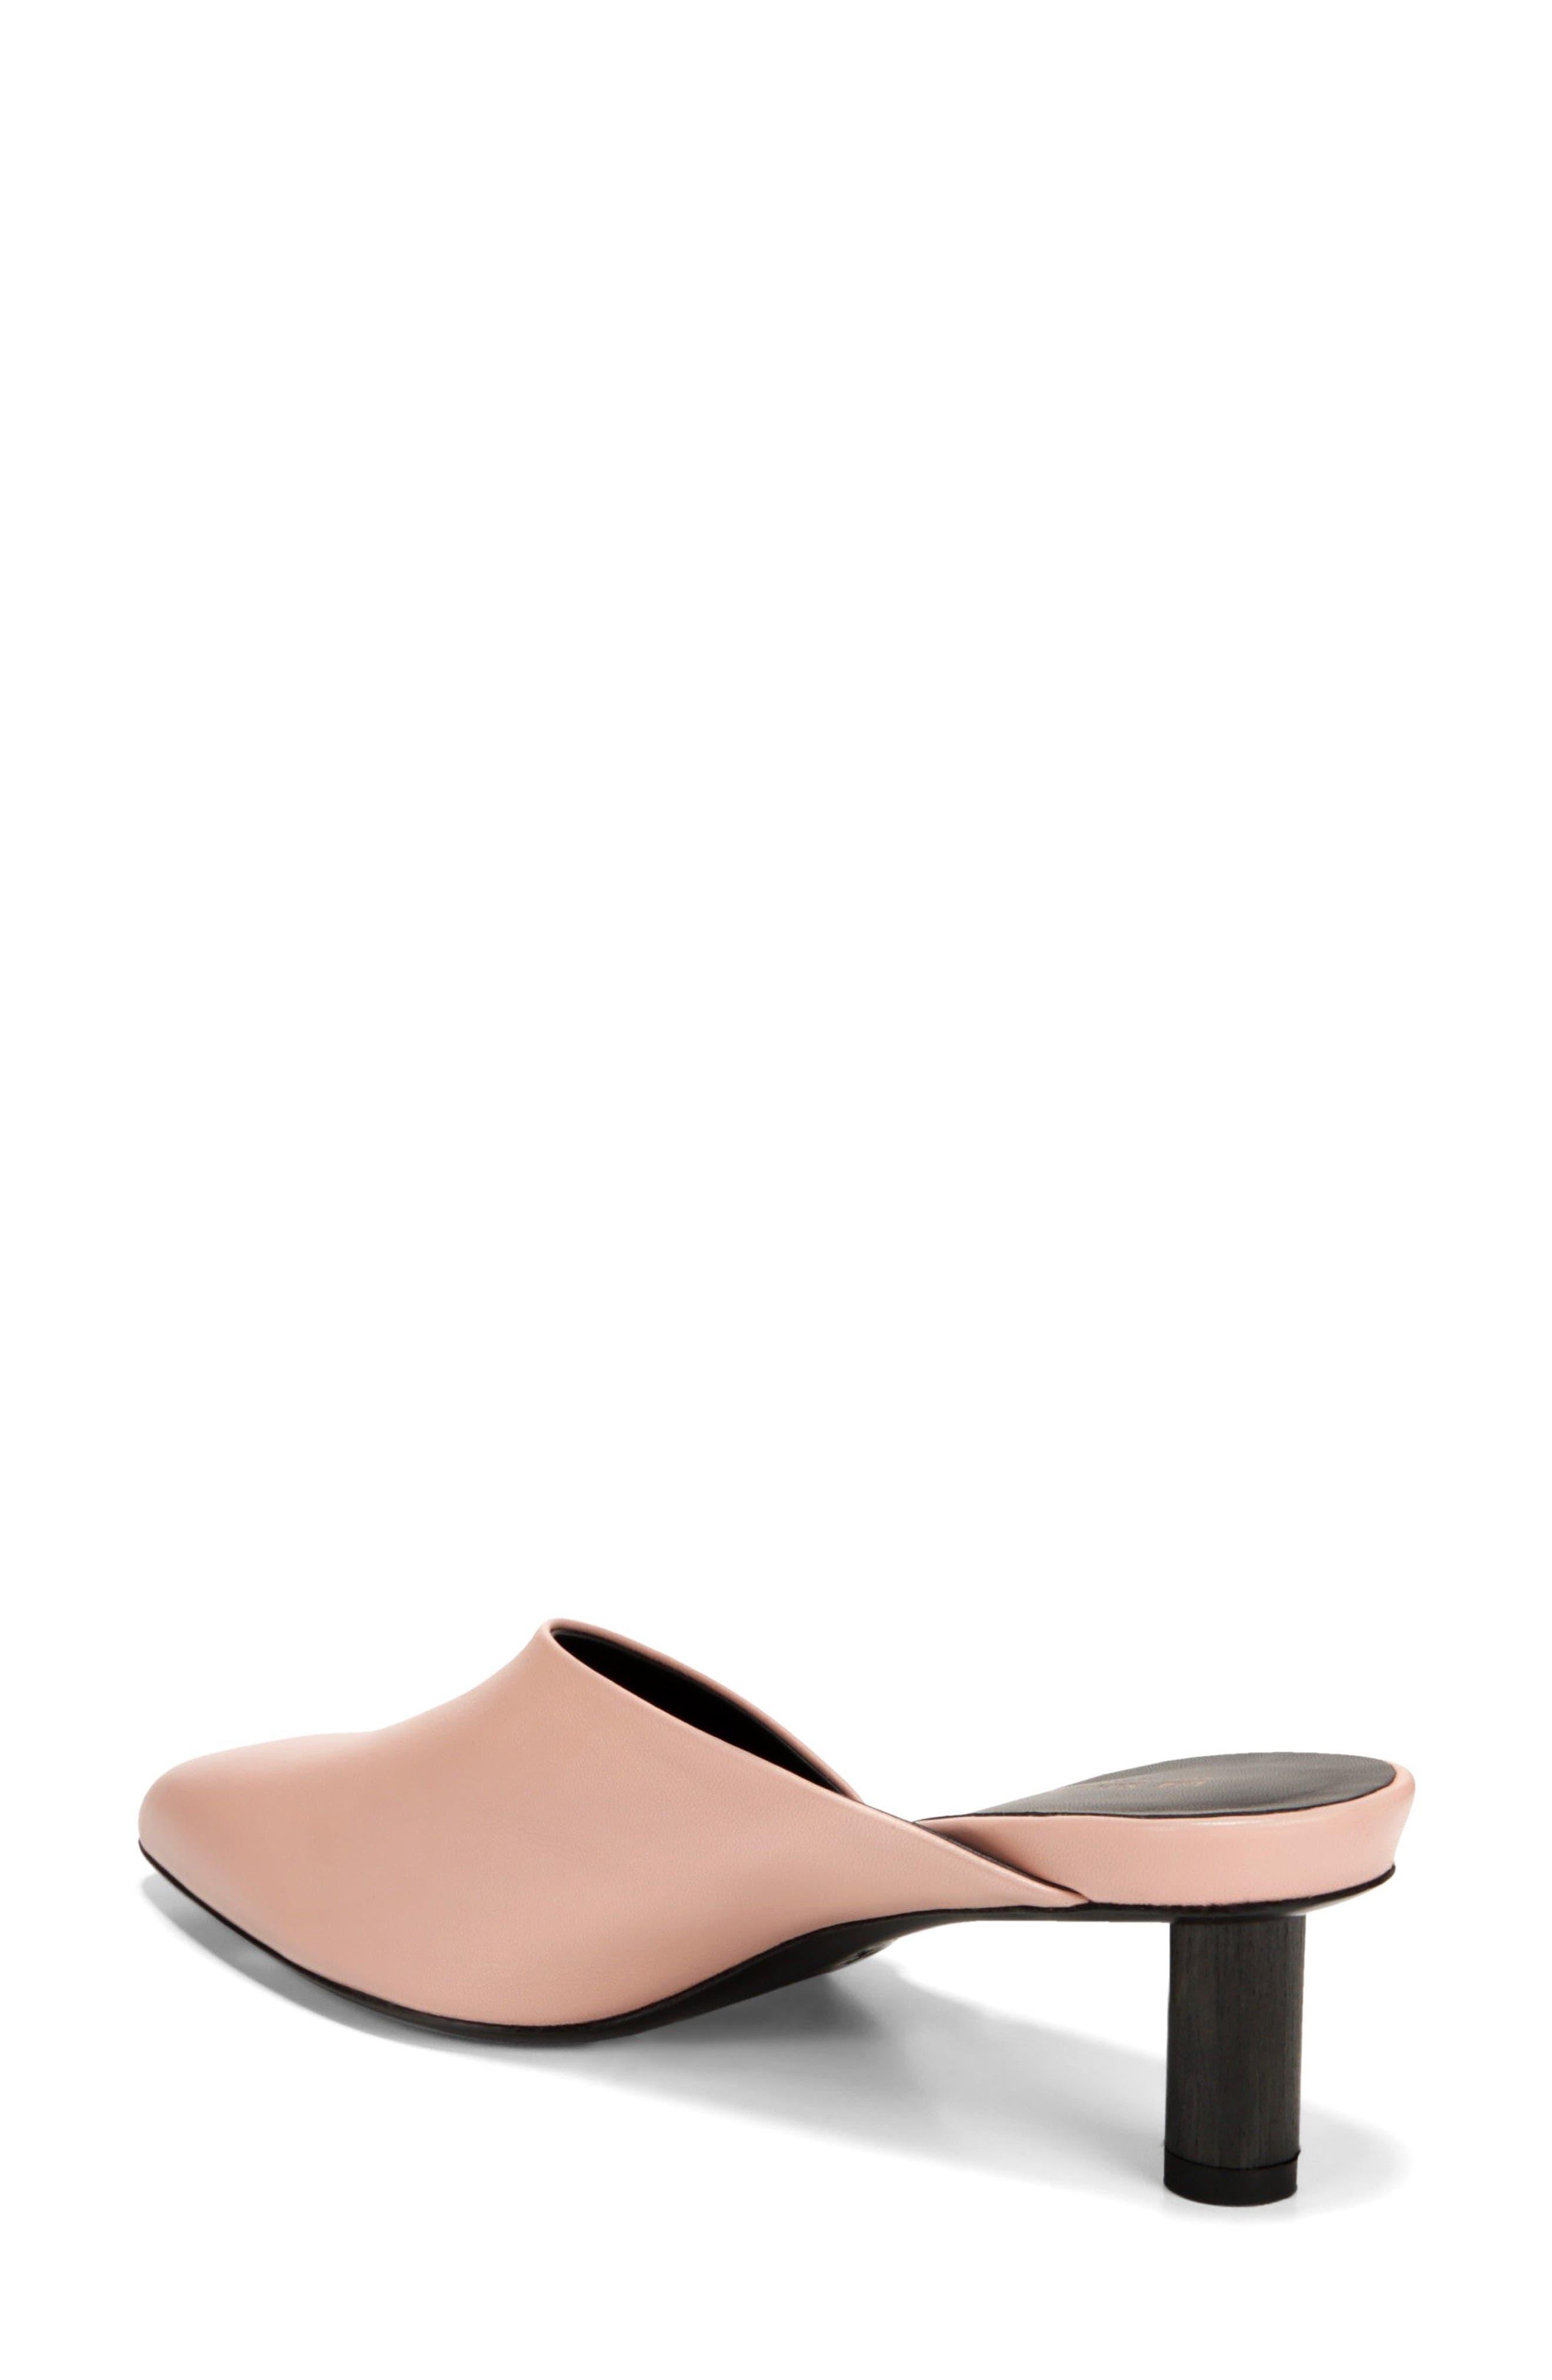 Freya Asymmetrical Mule,                             Alternate thumbnail 2, color,                             Sand Leather